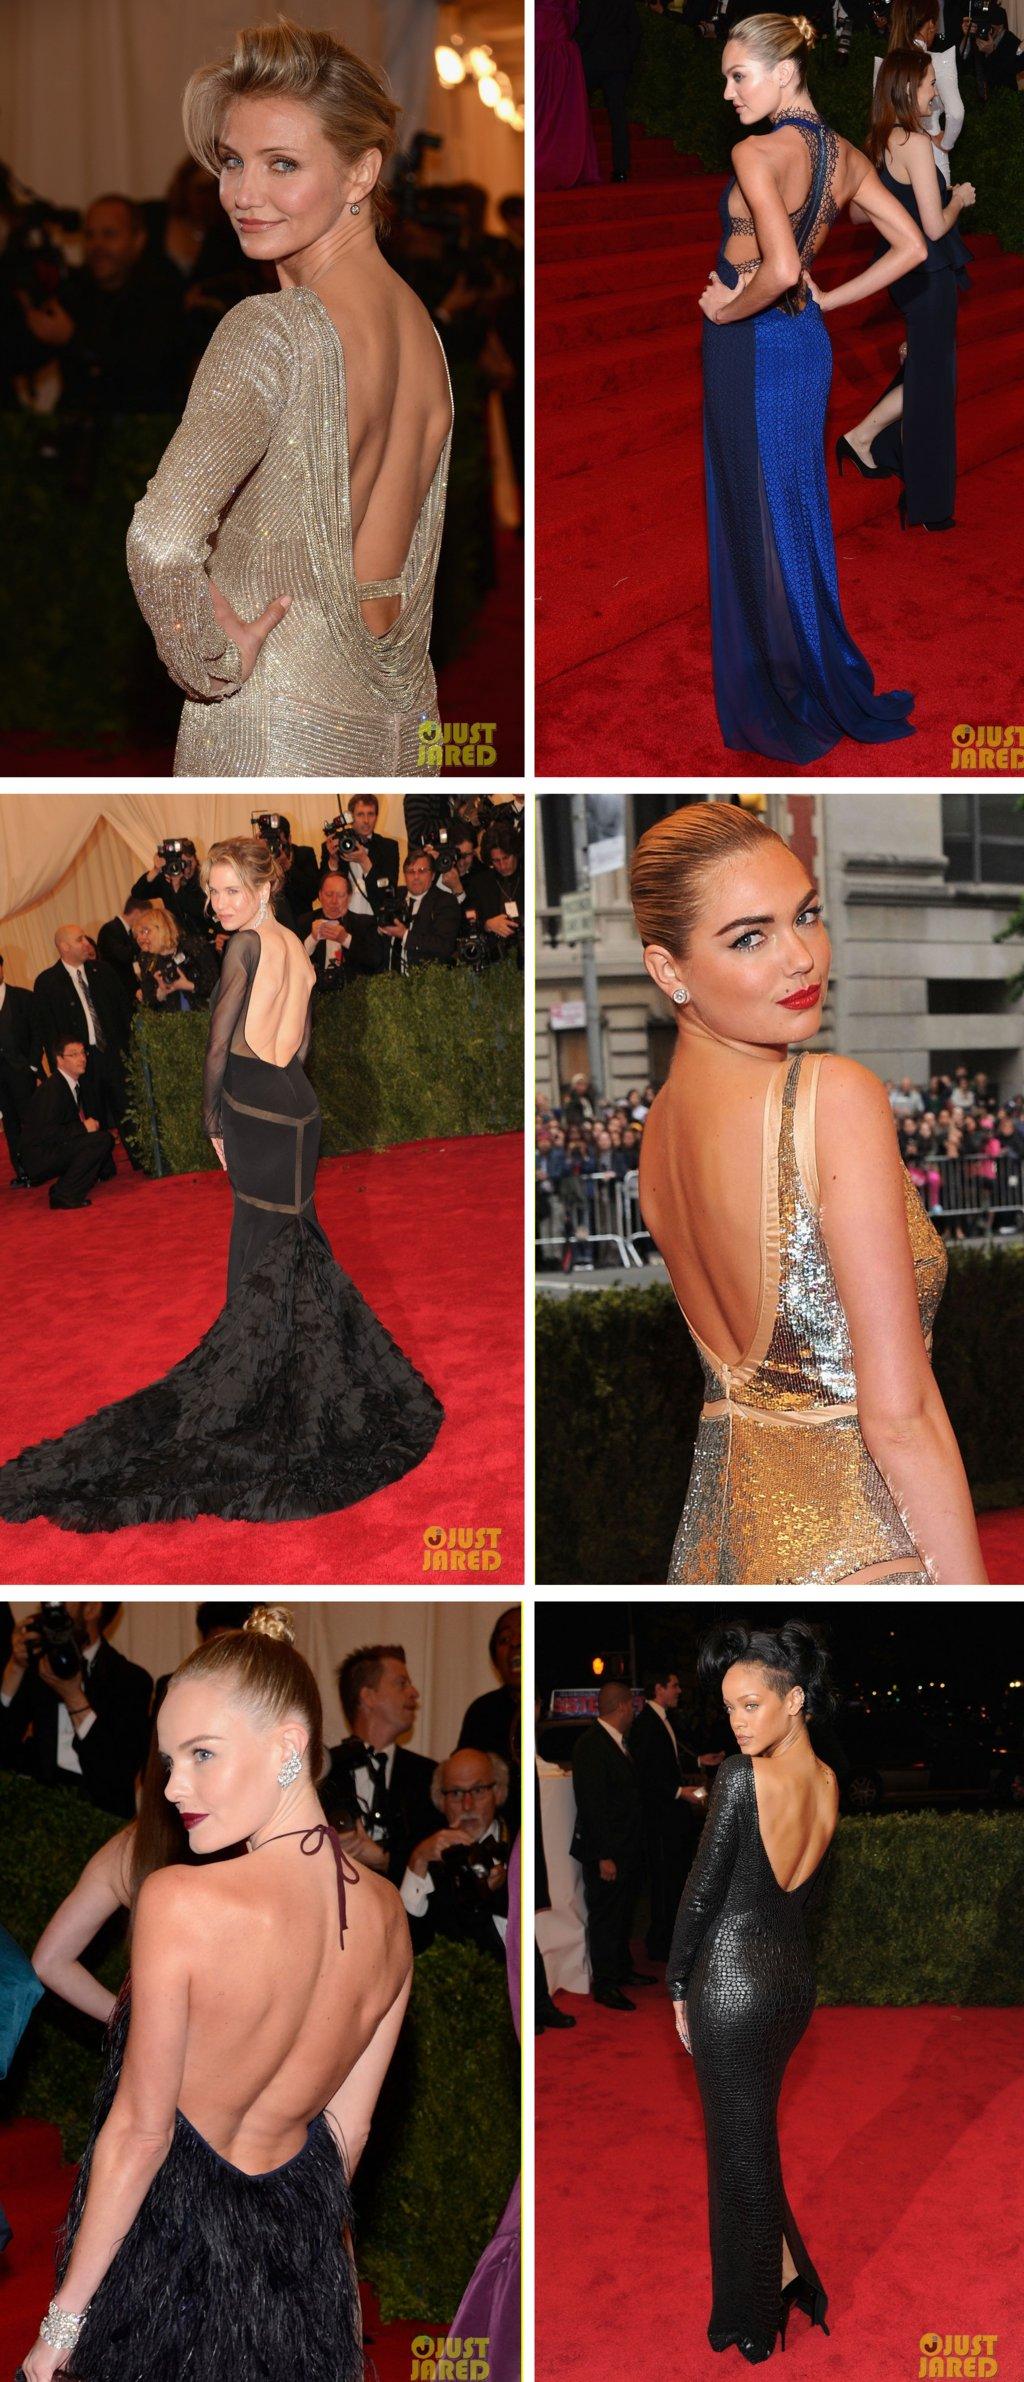 Met-ball-2012-wedding-fashion-inspiration-bridal-trends-open-backs.full